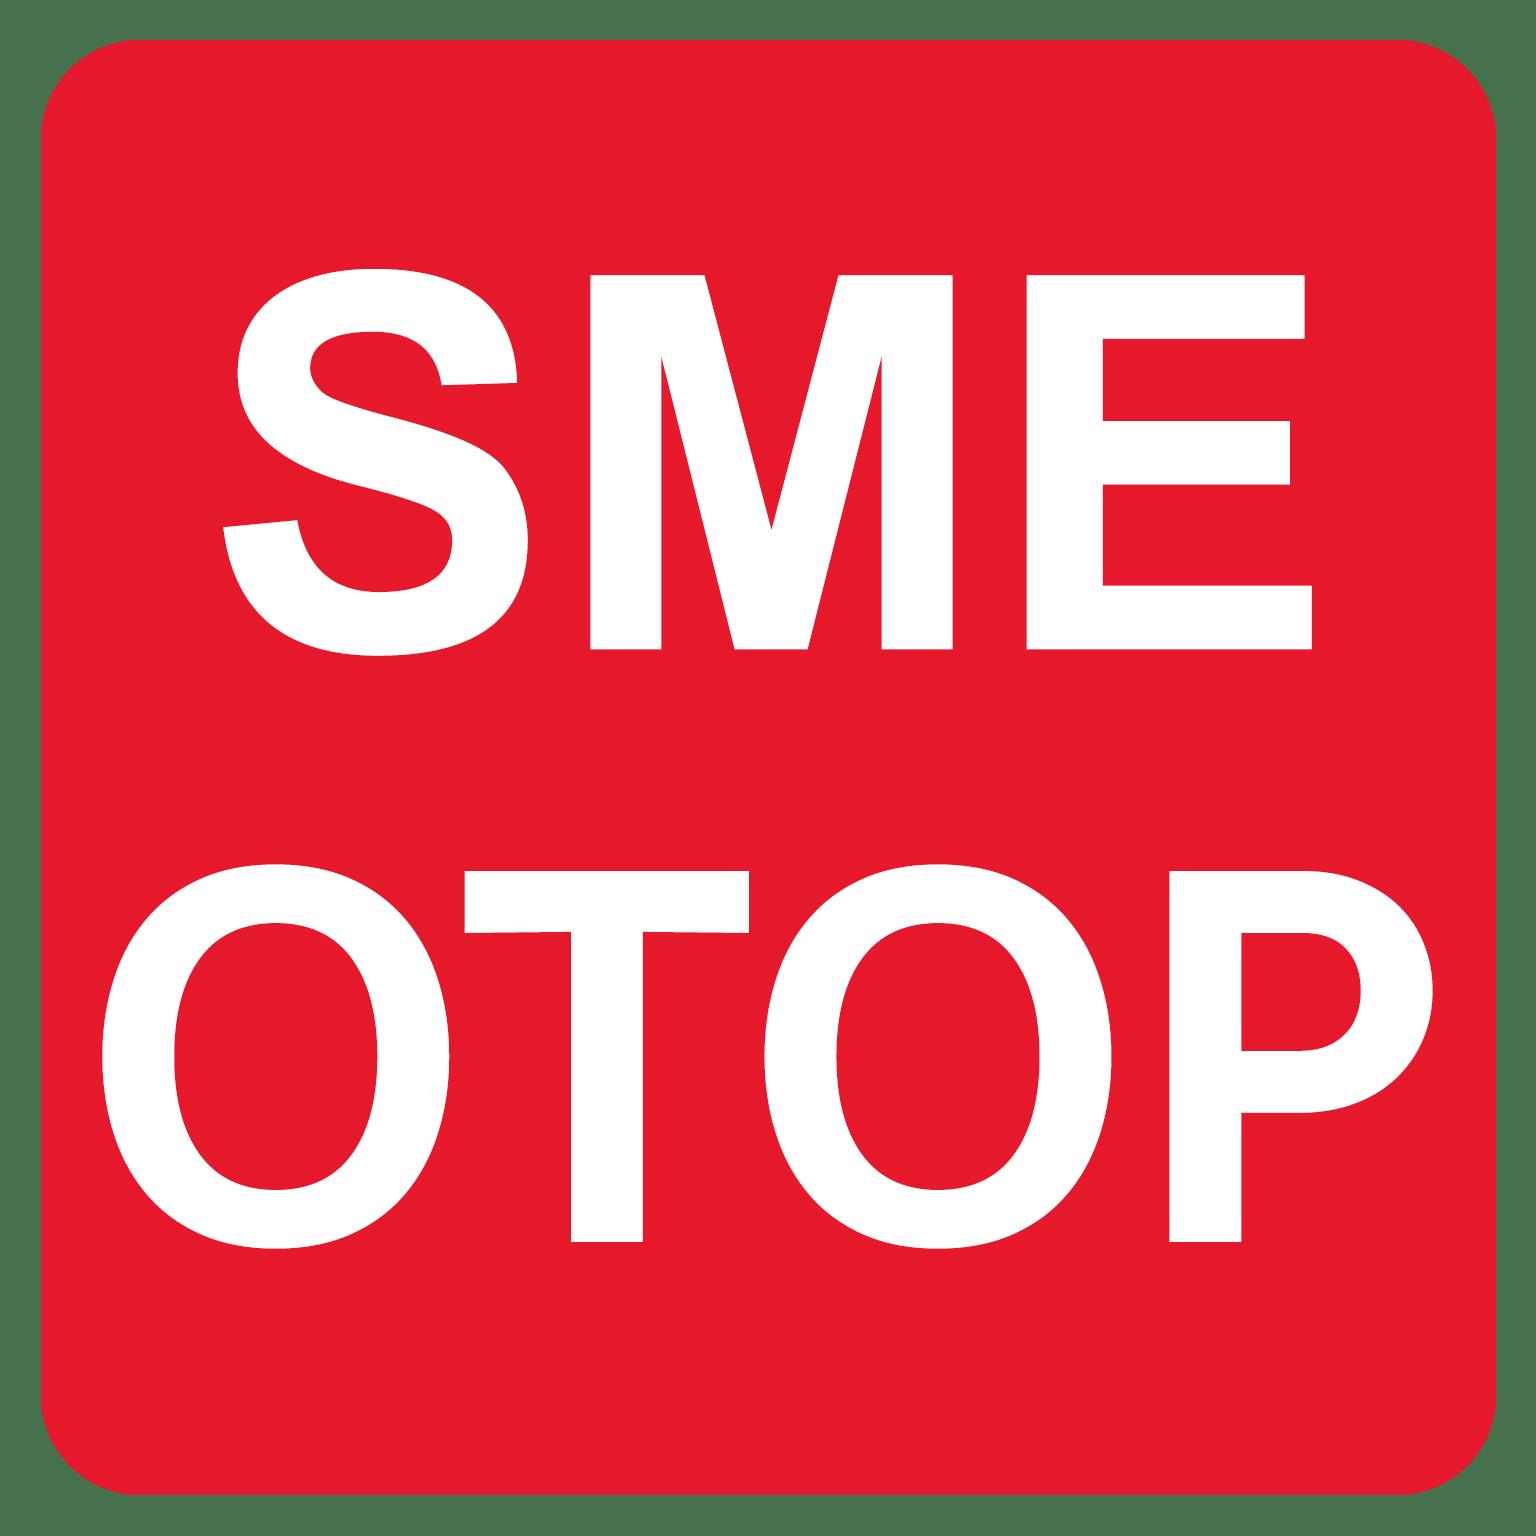 SME OTOP